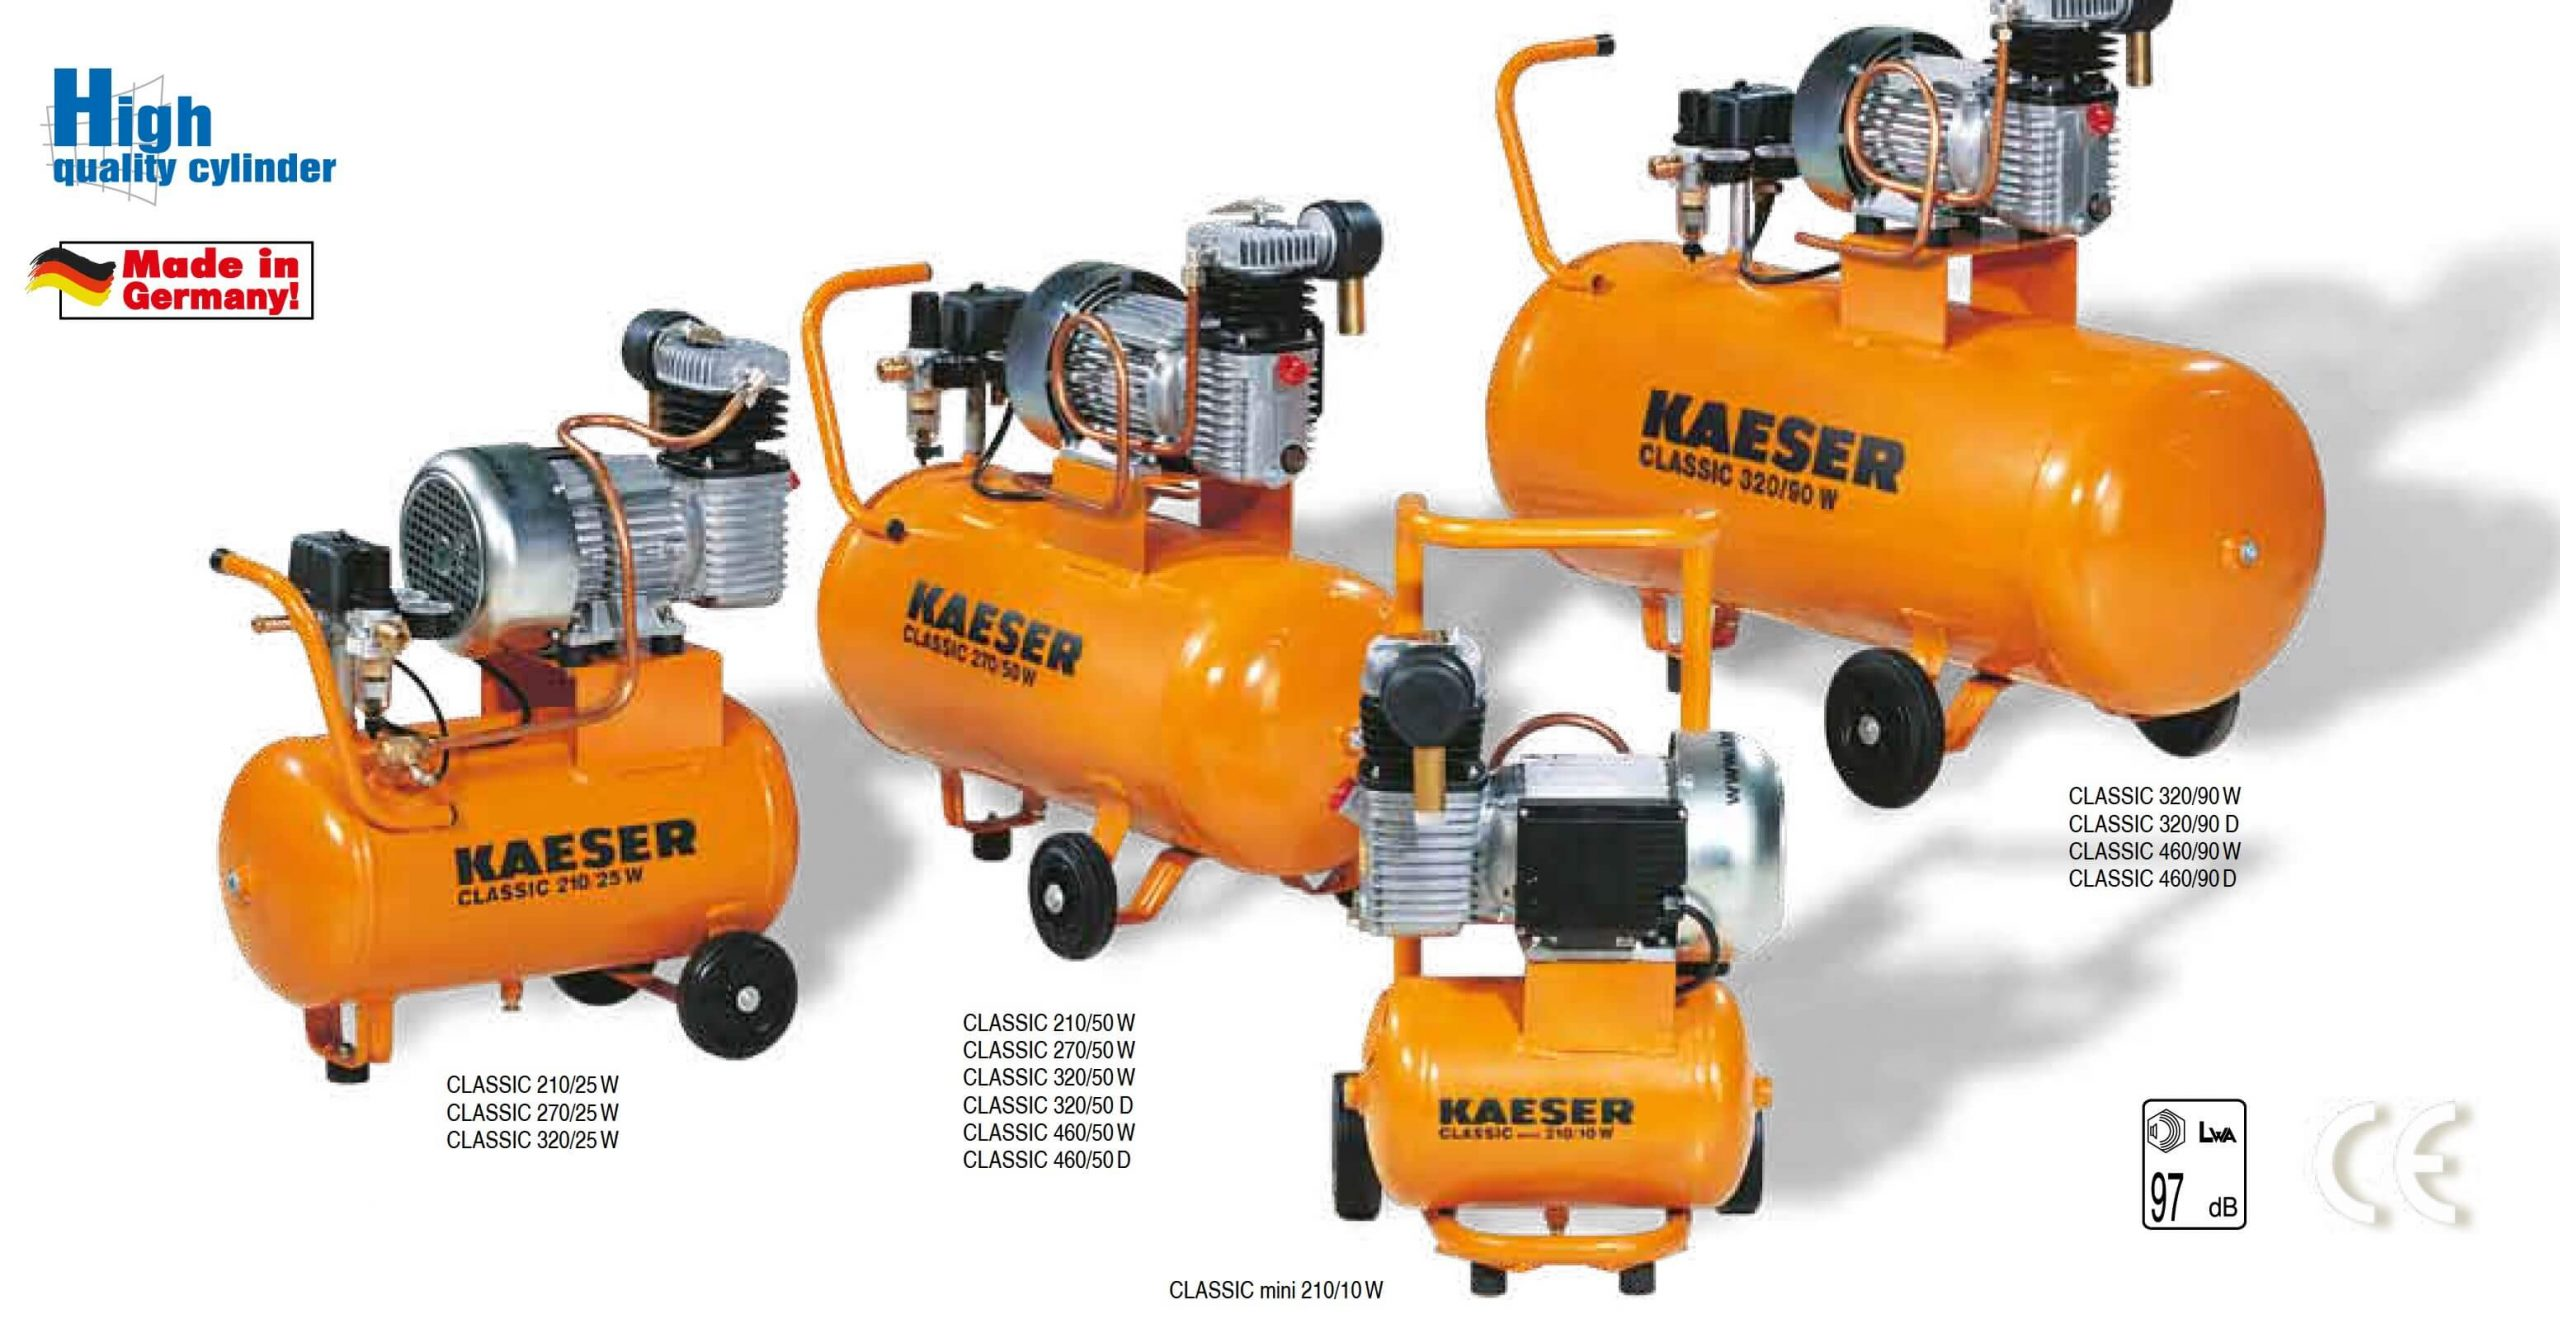 CLASSIC mini 210/10 W to CLASSIC 460/90 D